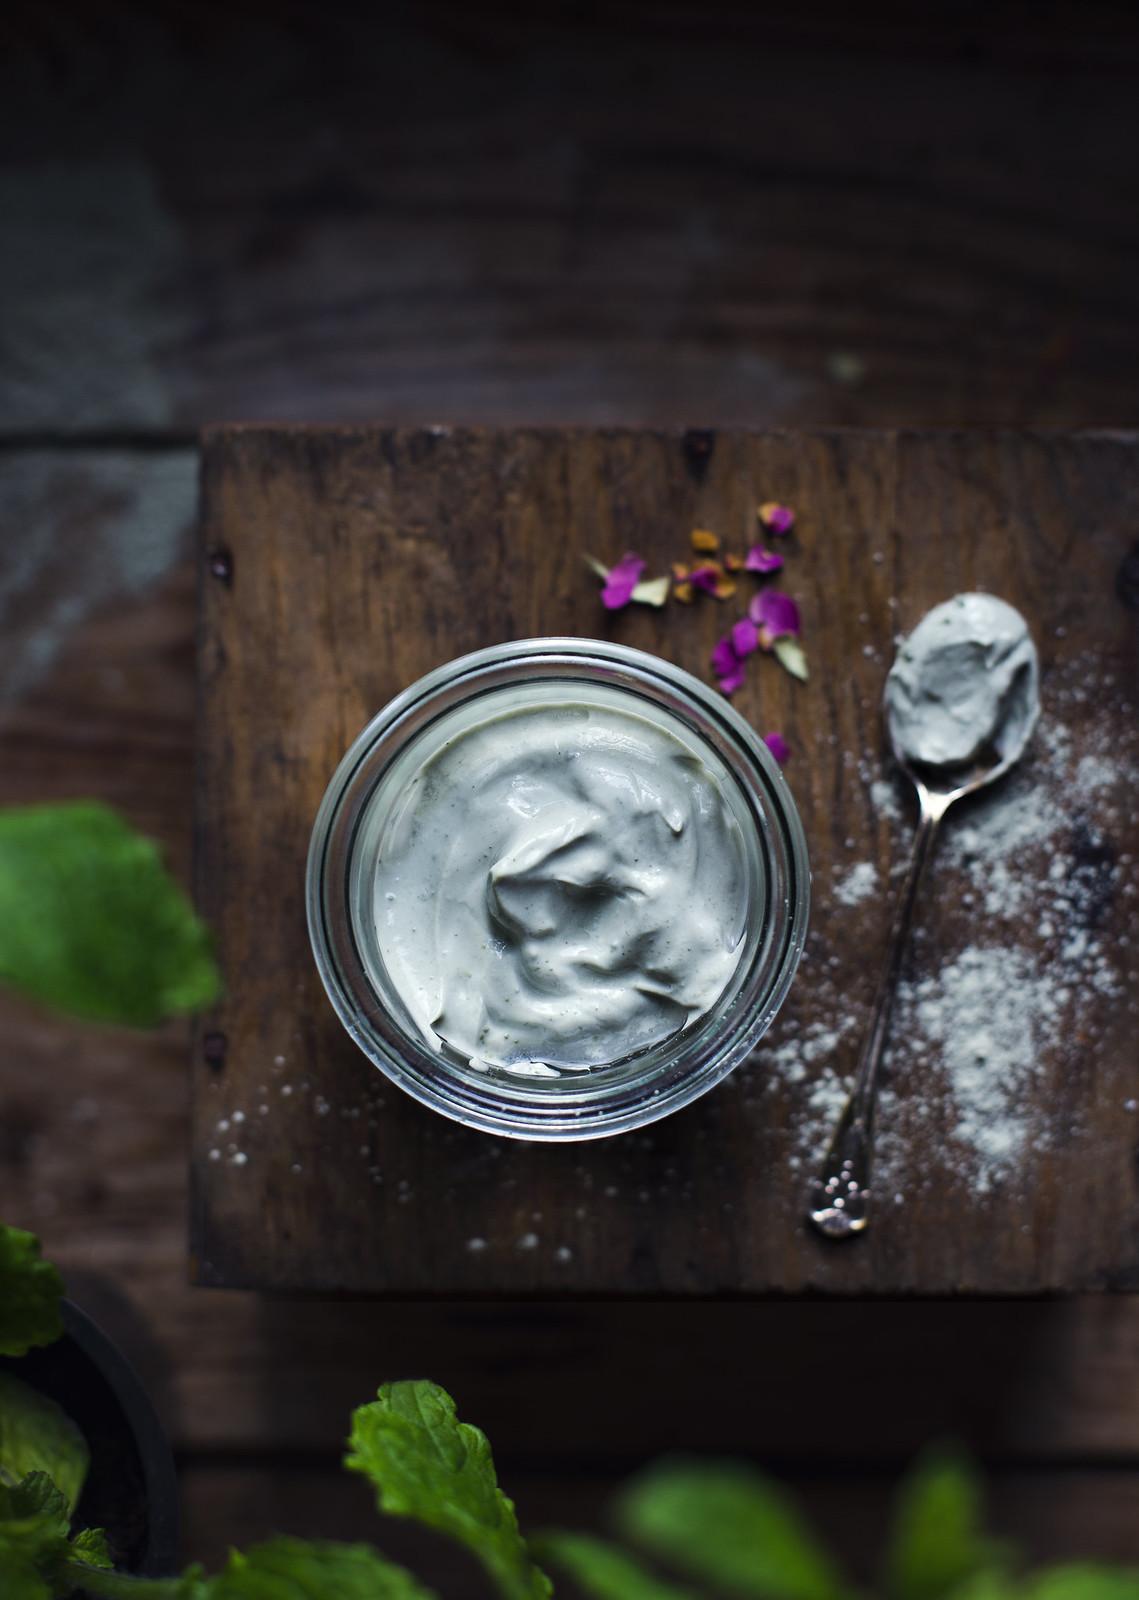 Hemgjord Ansiktsmask med Grön Lera, Yoghurt & Lavendel - Evelinas Ekologiska